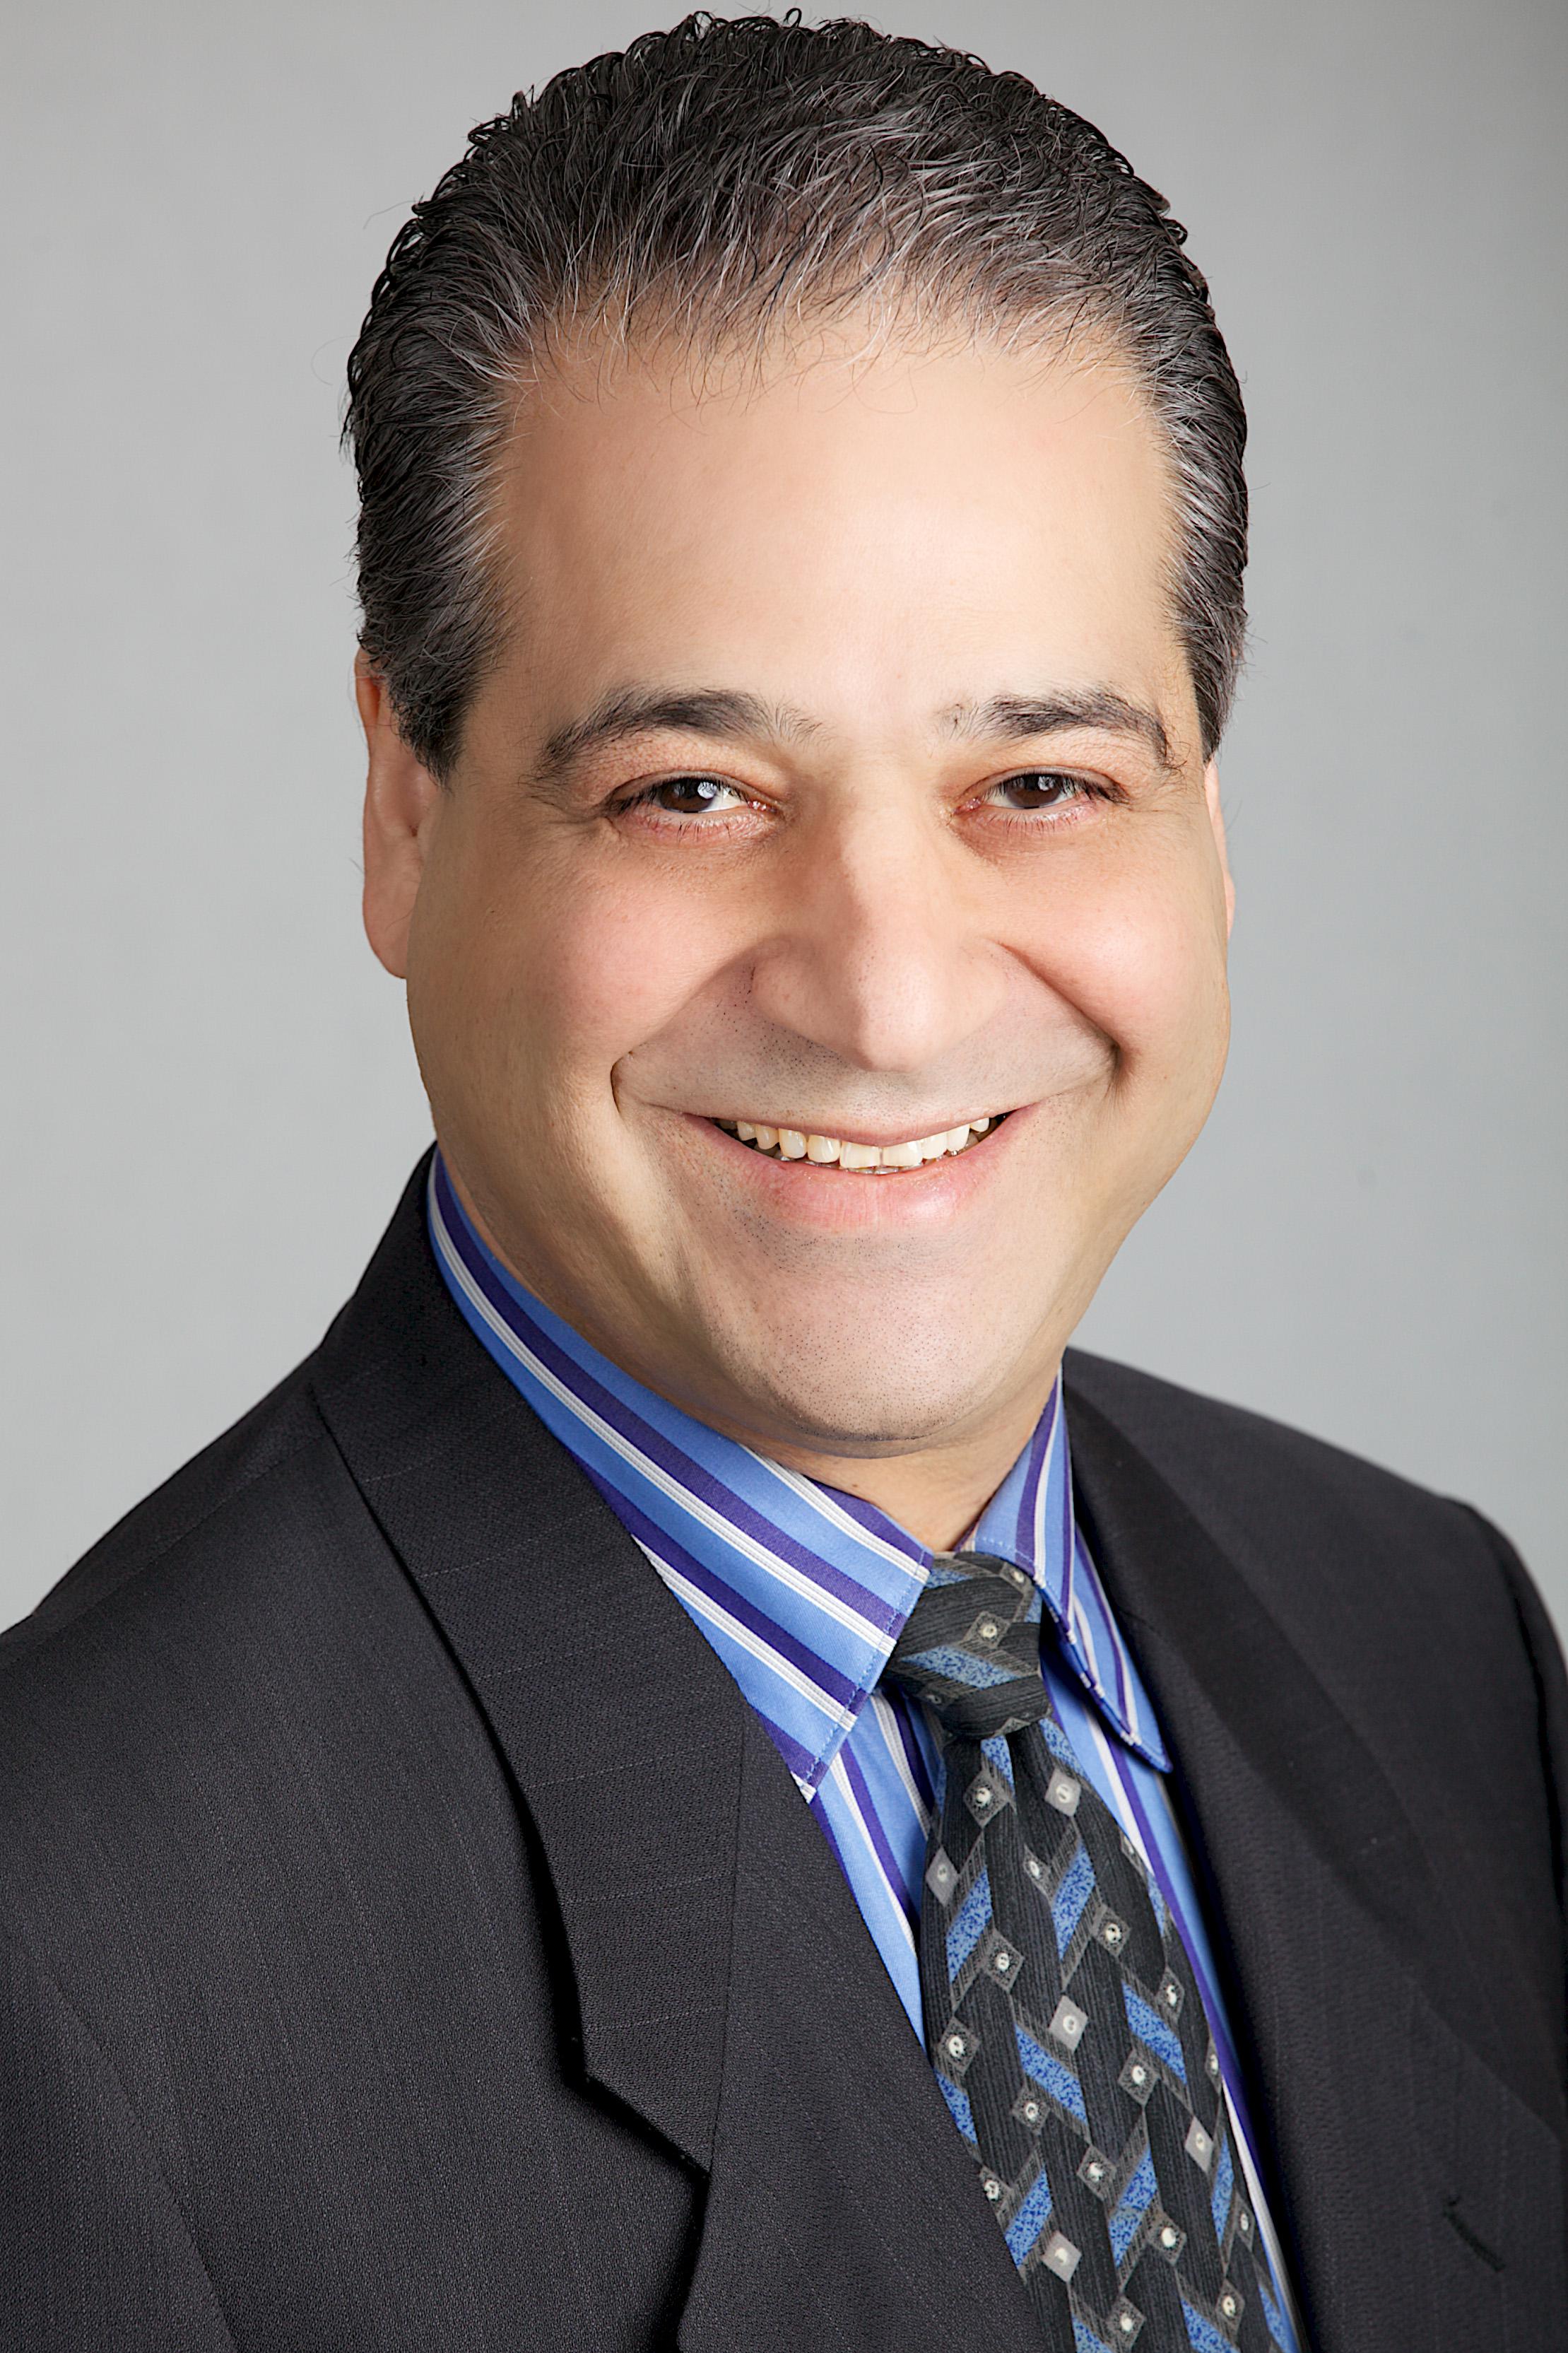 David undefined Hariri